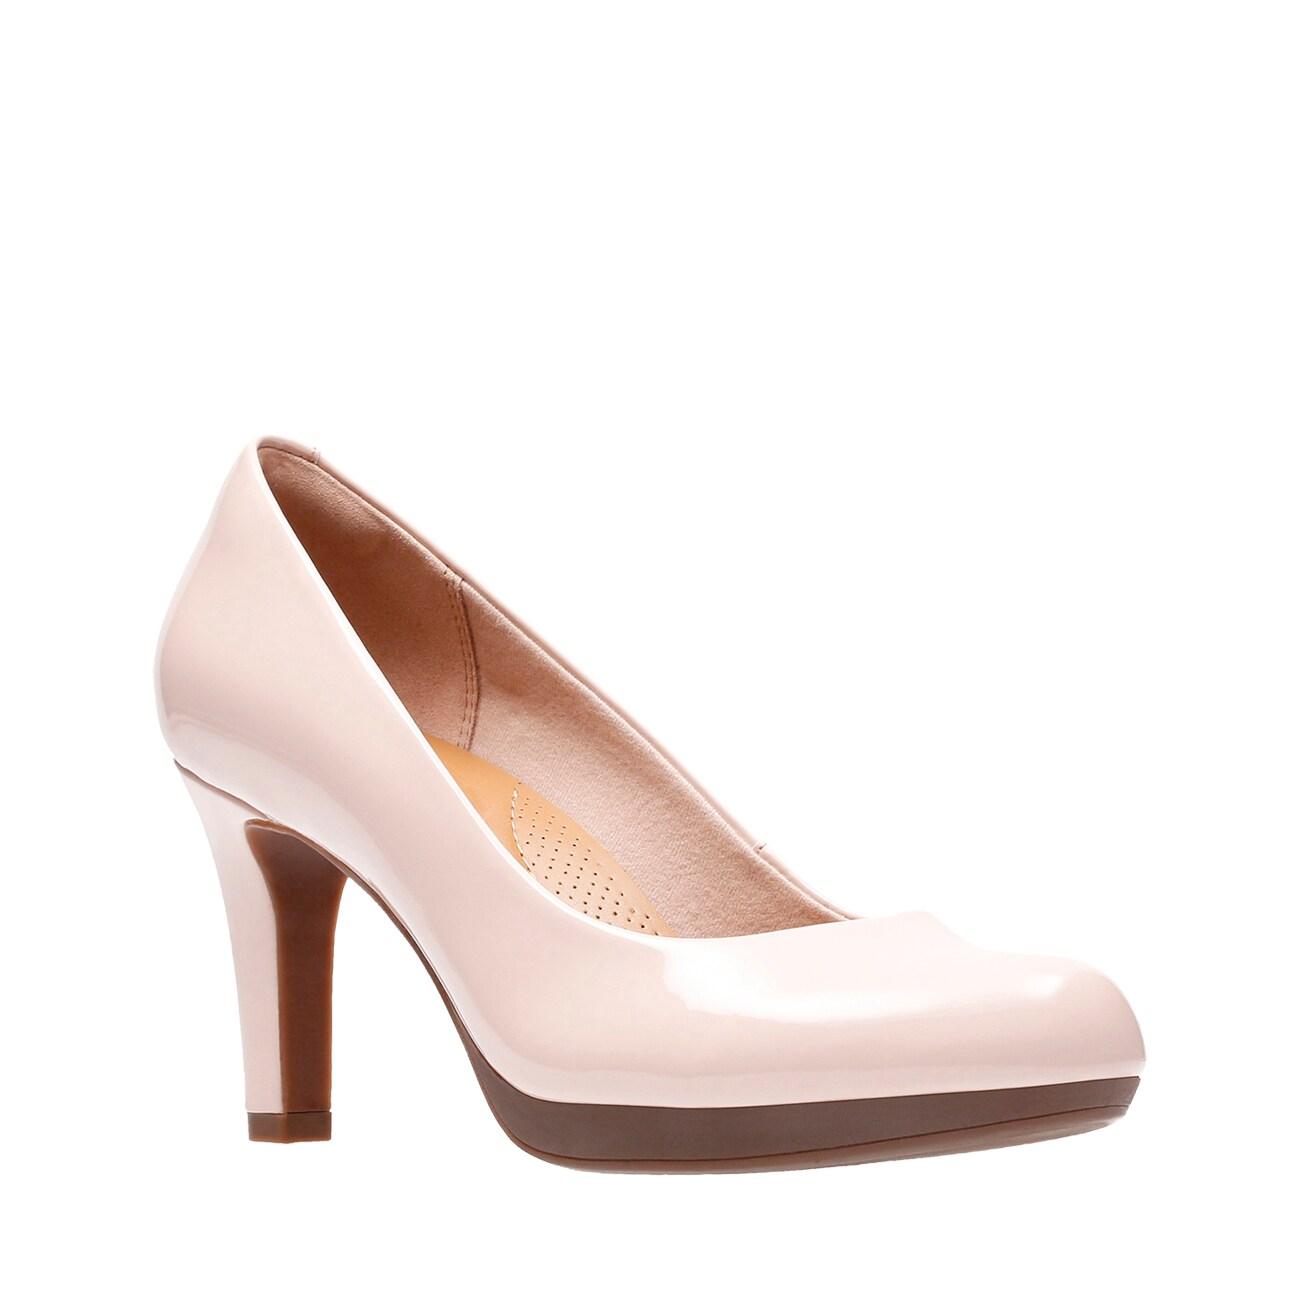 Details about  /CLARKS Adriel Viola Ladies Patent High Heel Shoe